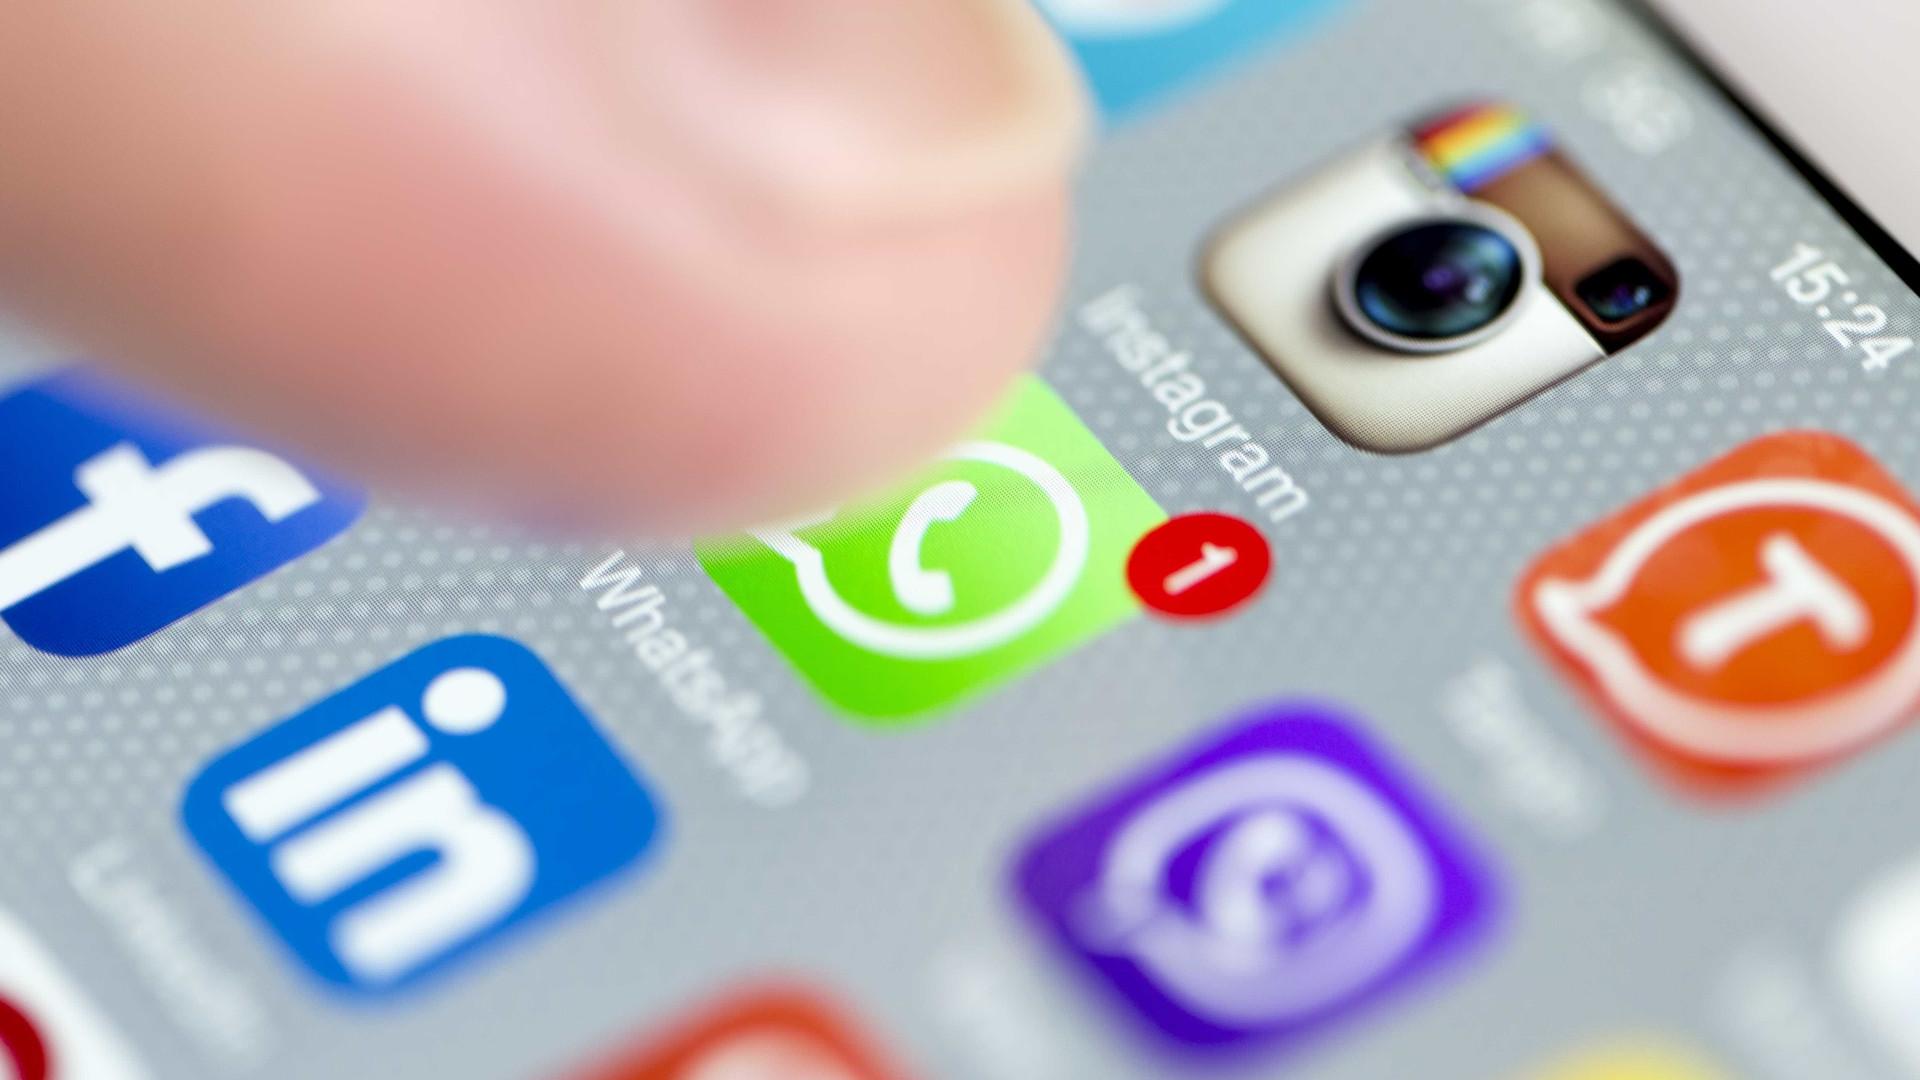 WhatsApp Web e Android recebem novos emojis